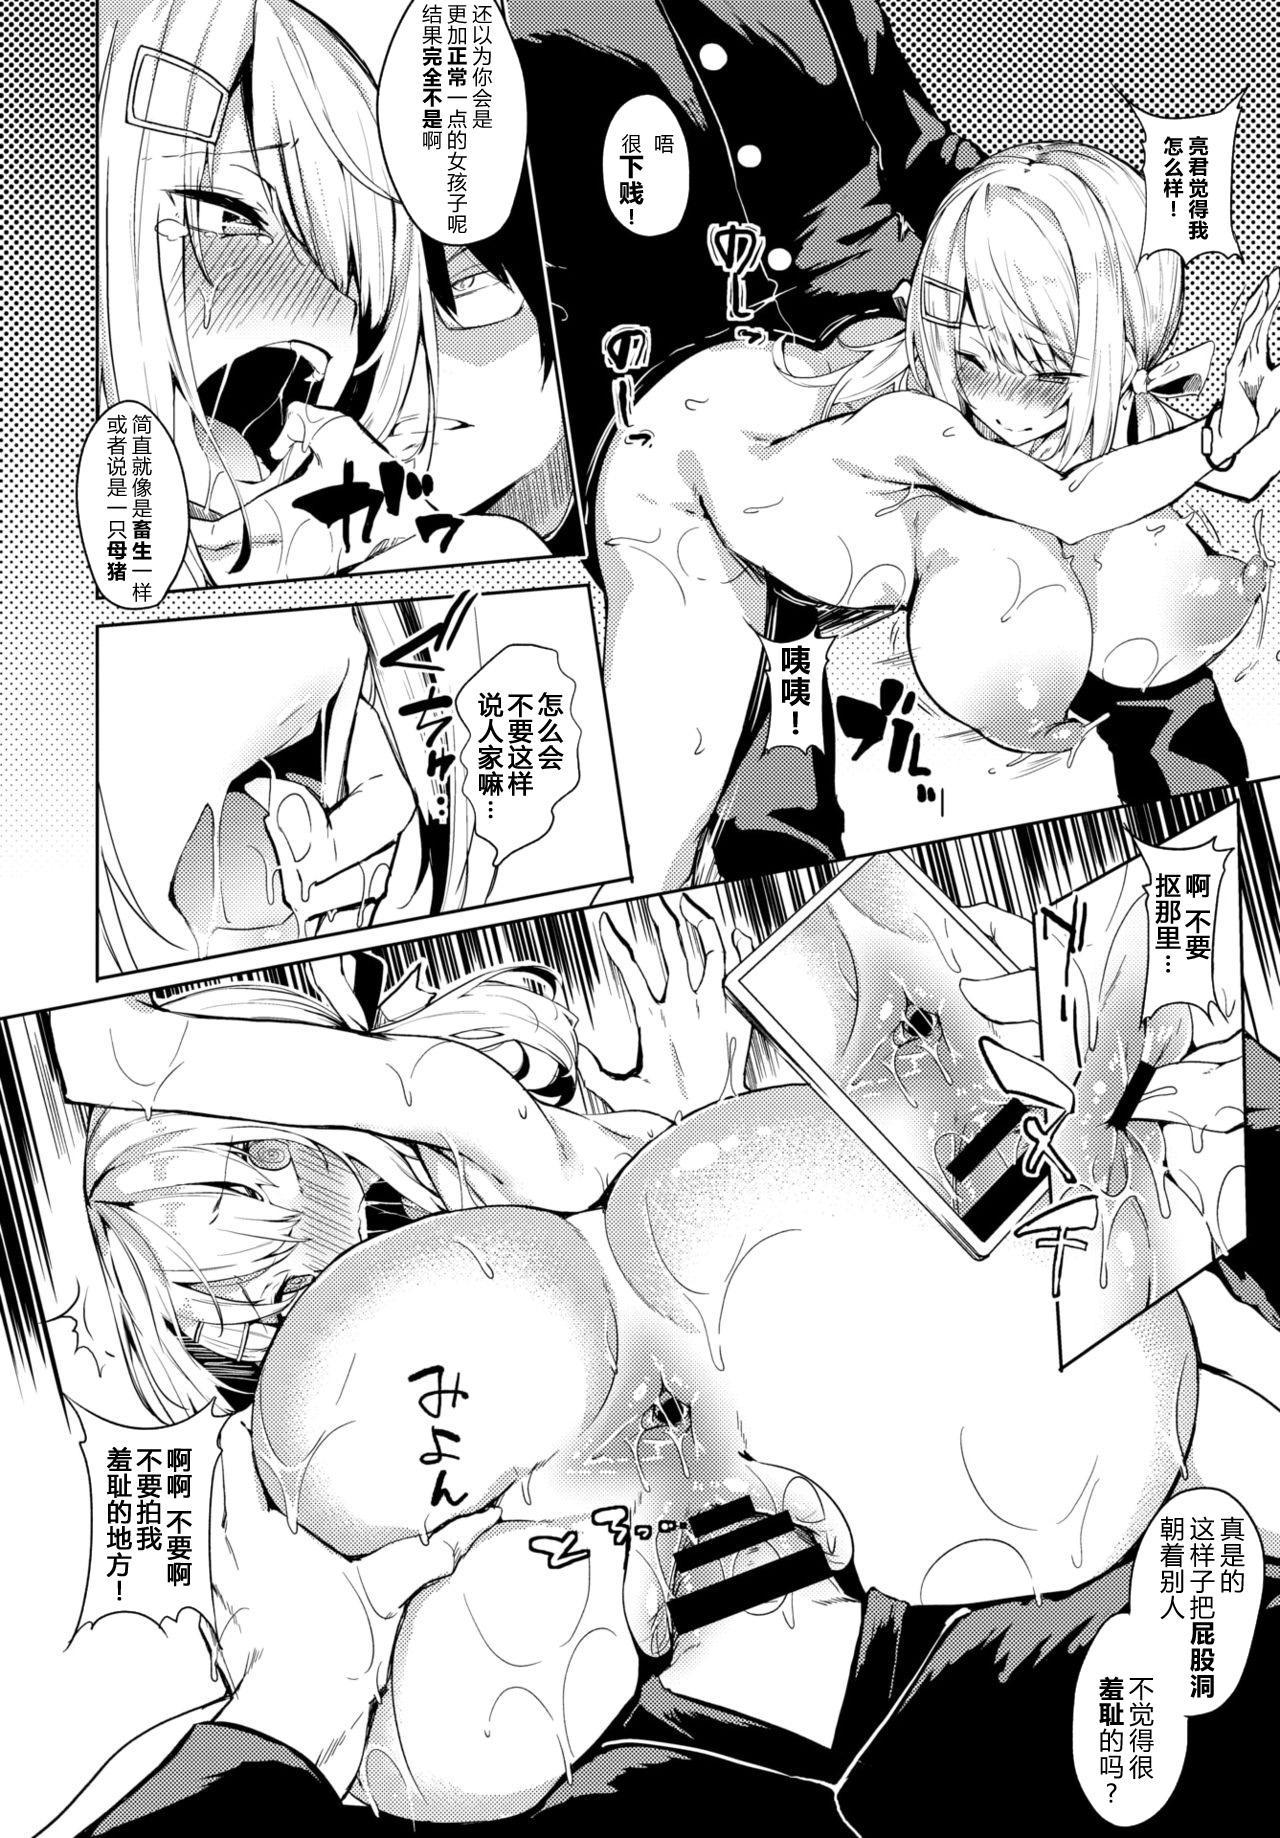 Ijimete Hoshii I want you to taste | 我想你继续欺负我 14